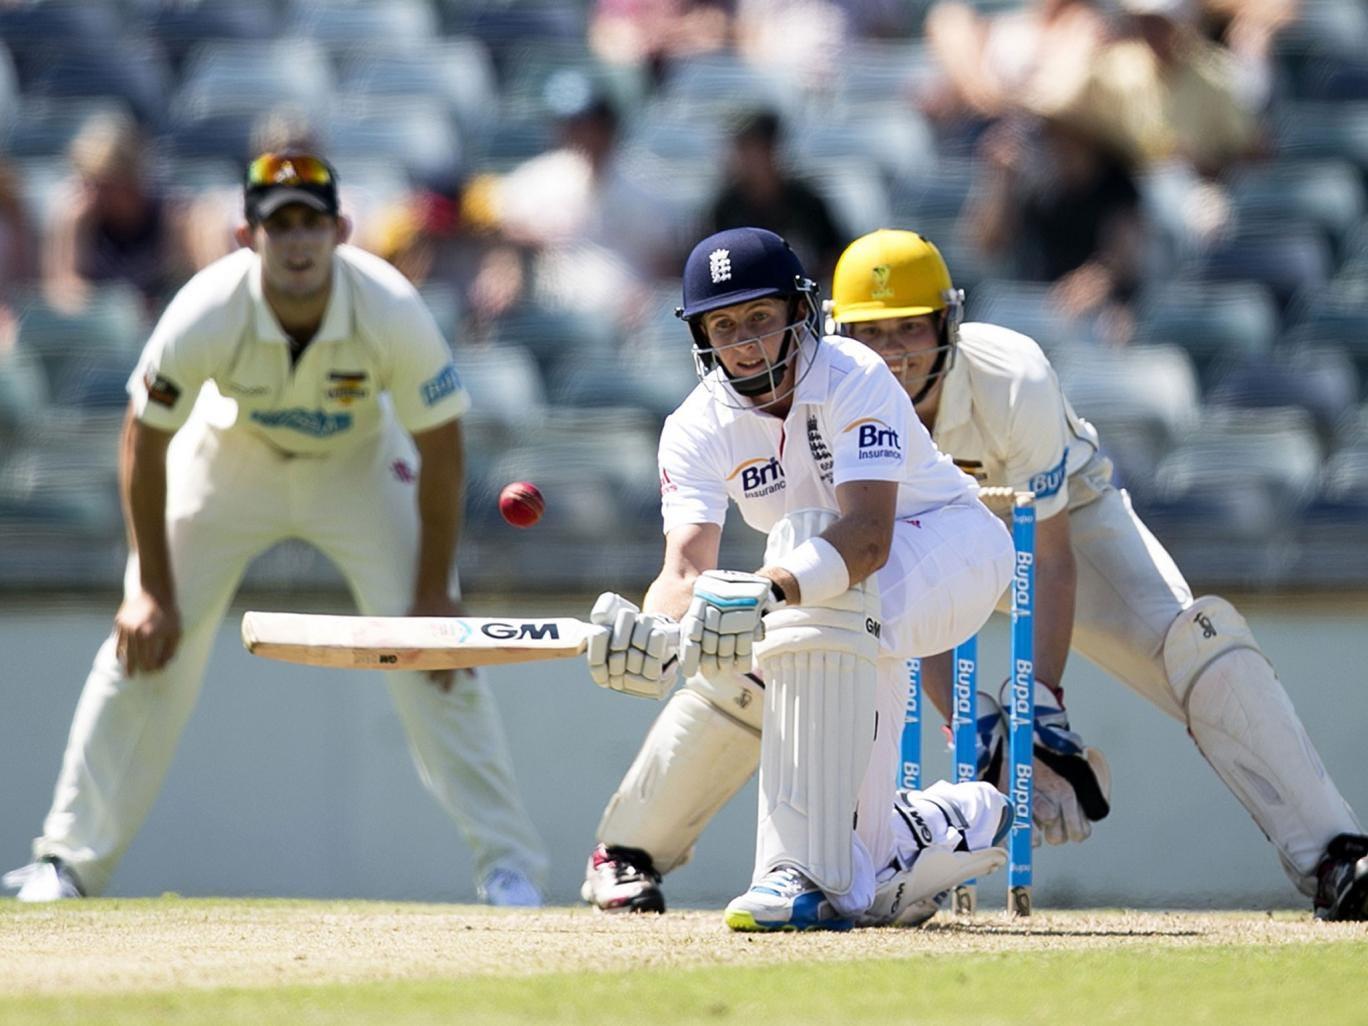 England's Joe Root bats against the Western Australia Chairman's XI in Perth last week